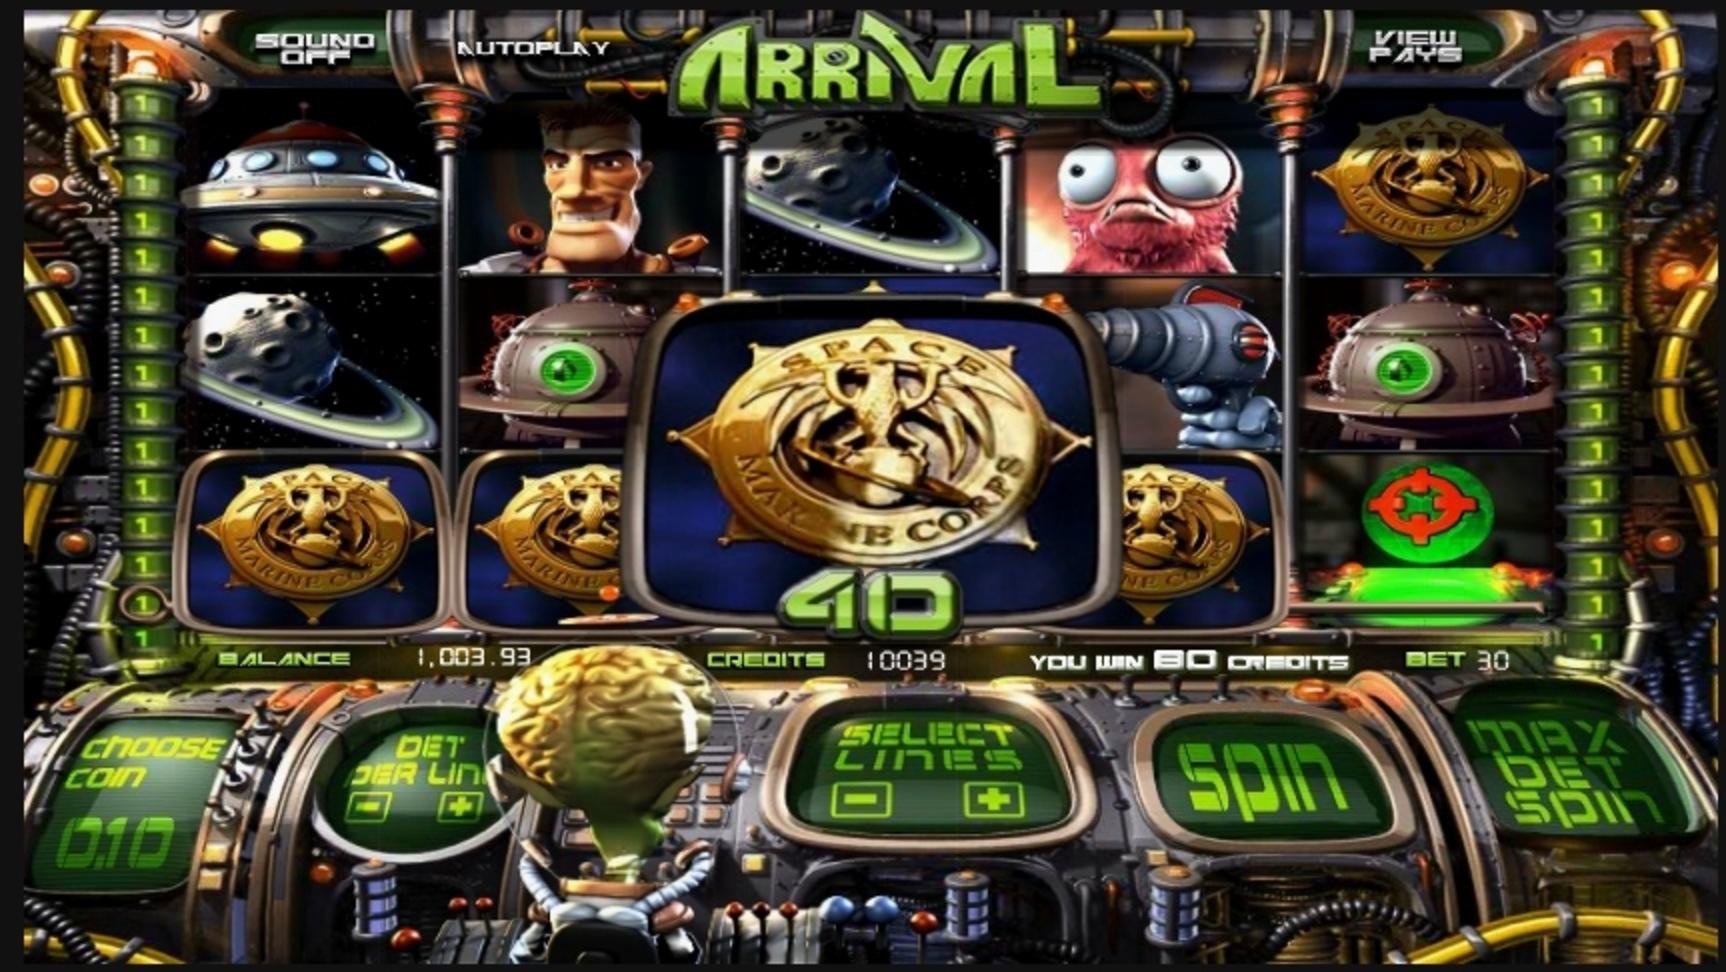 Arrival Slot Machine